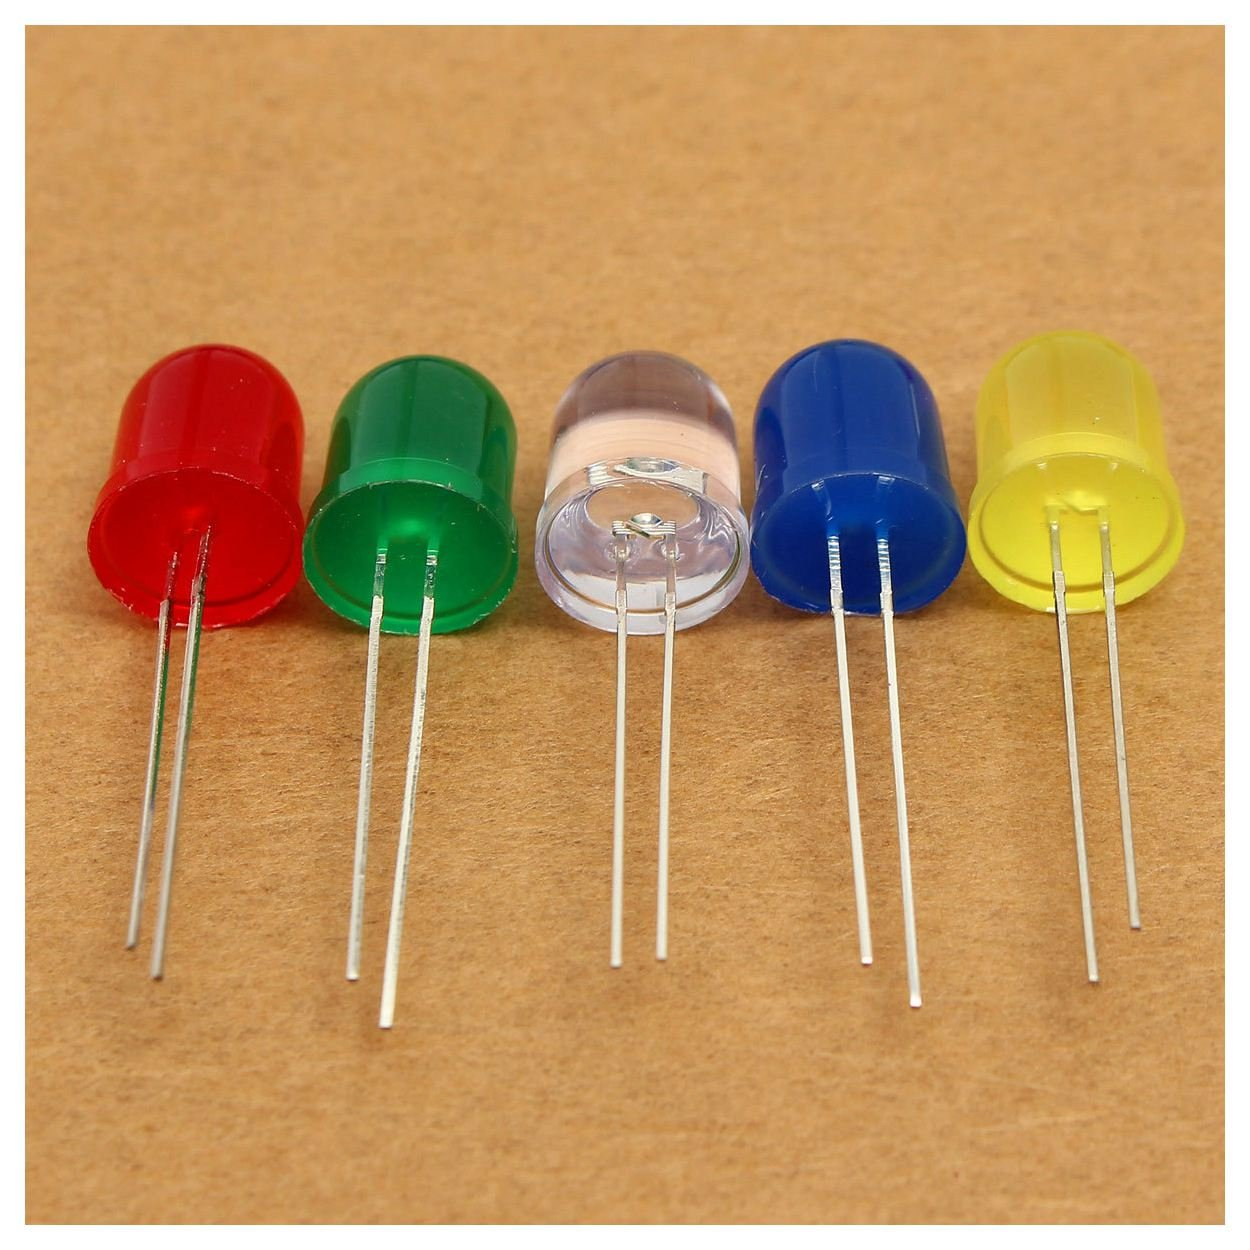 100pcs 10mm Orange Diffused Round Top Bright LED 5K MCD Leds Lamp Lights R